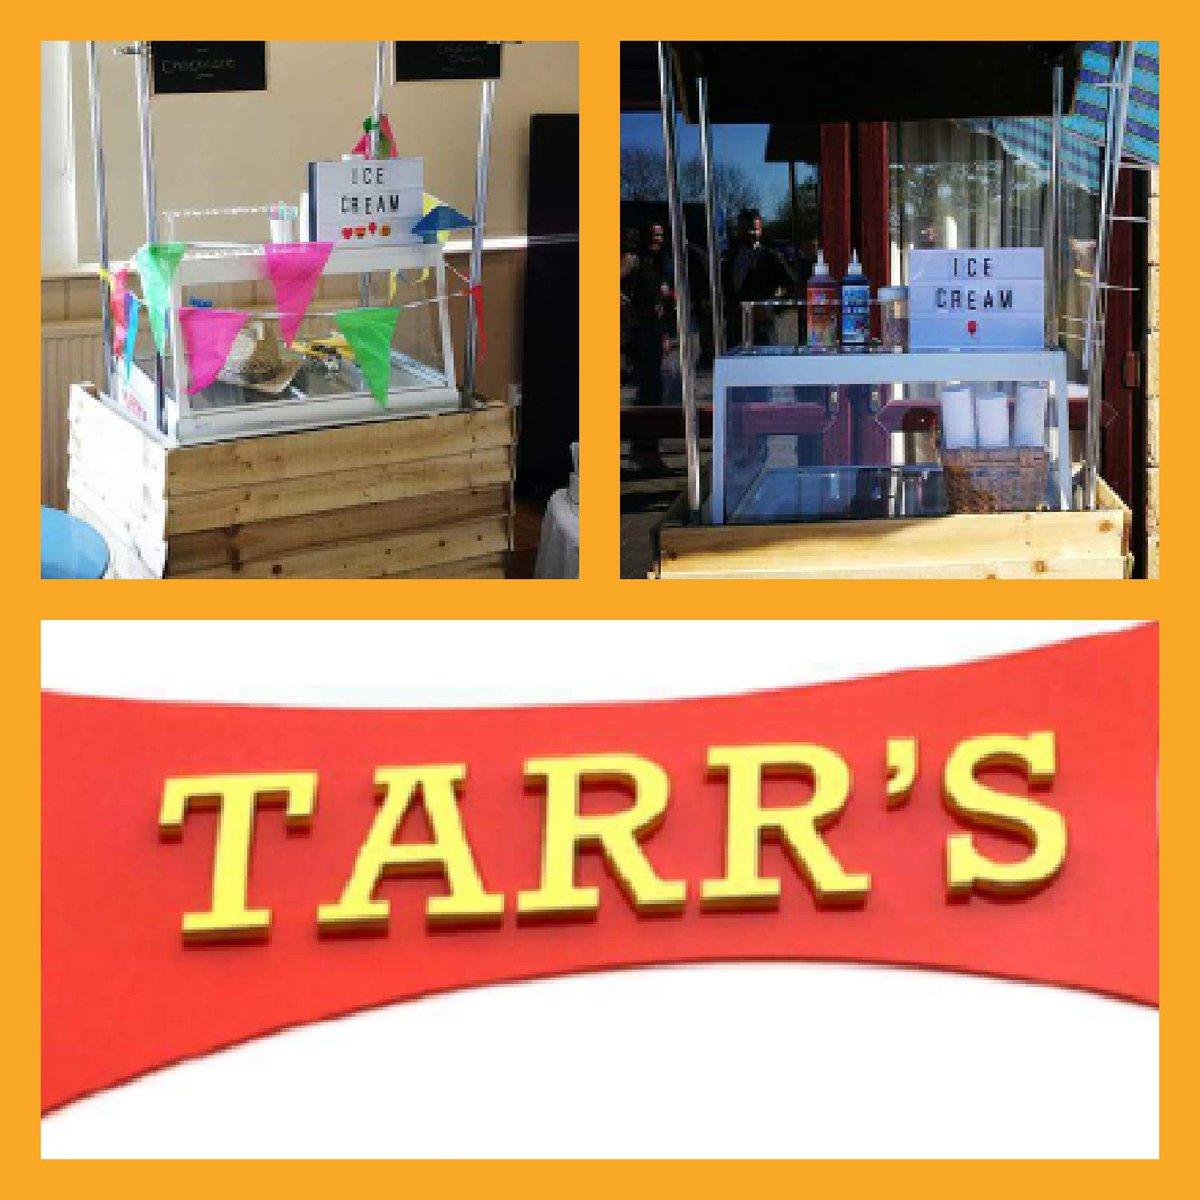 @TarrsIceCream book our #icecream #cart for your event